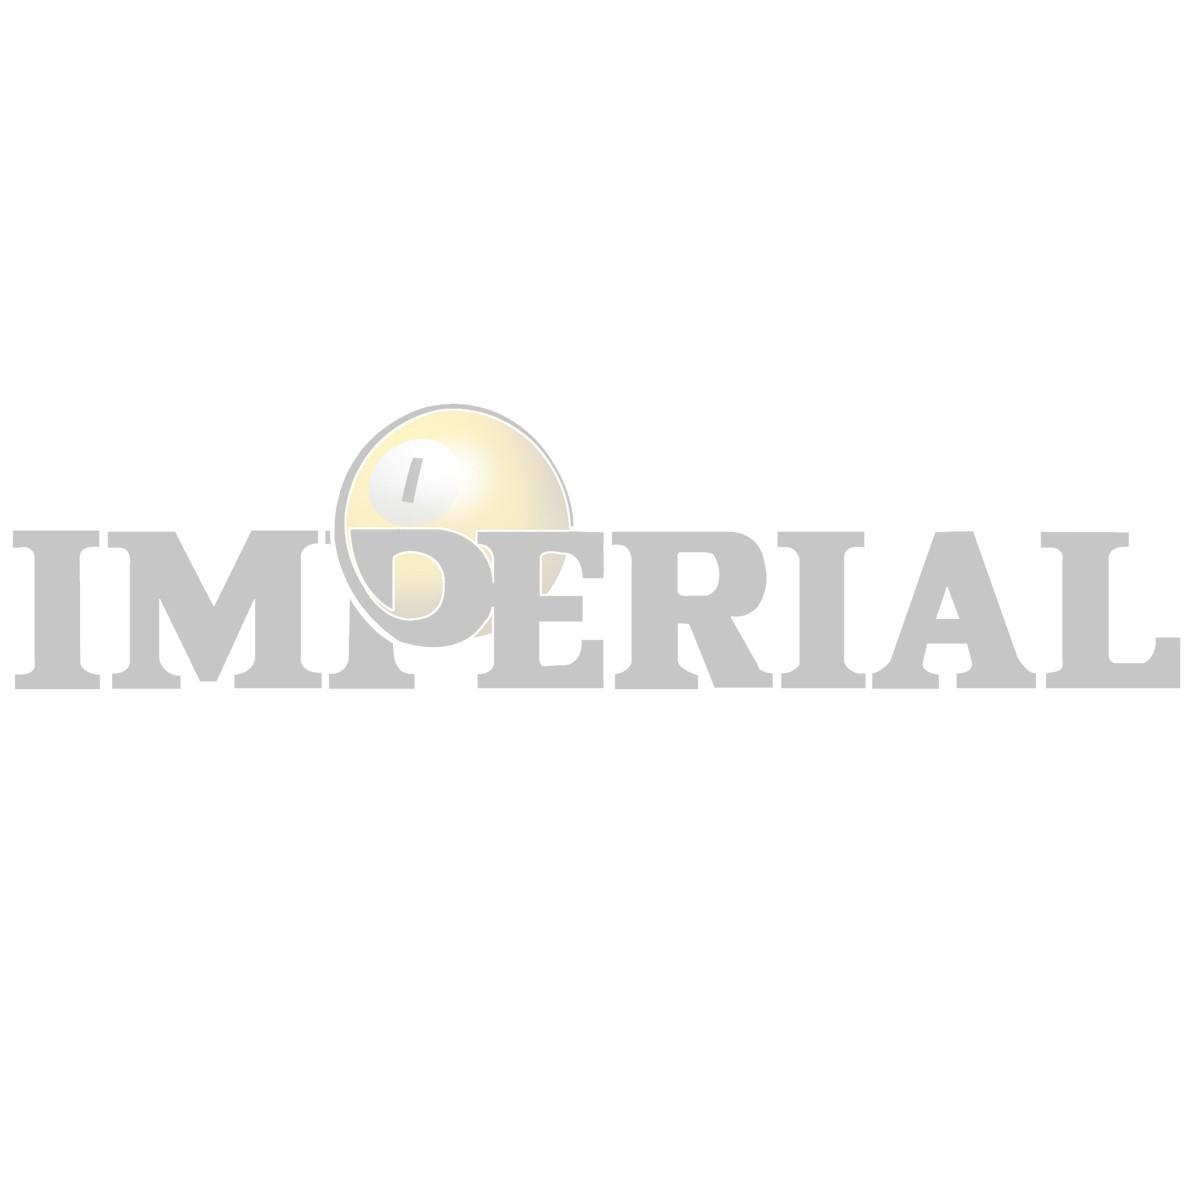 Indianapolis Colts 8-foot Billiard Cloth